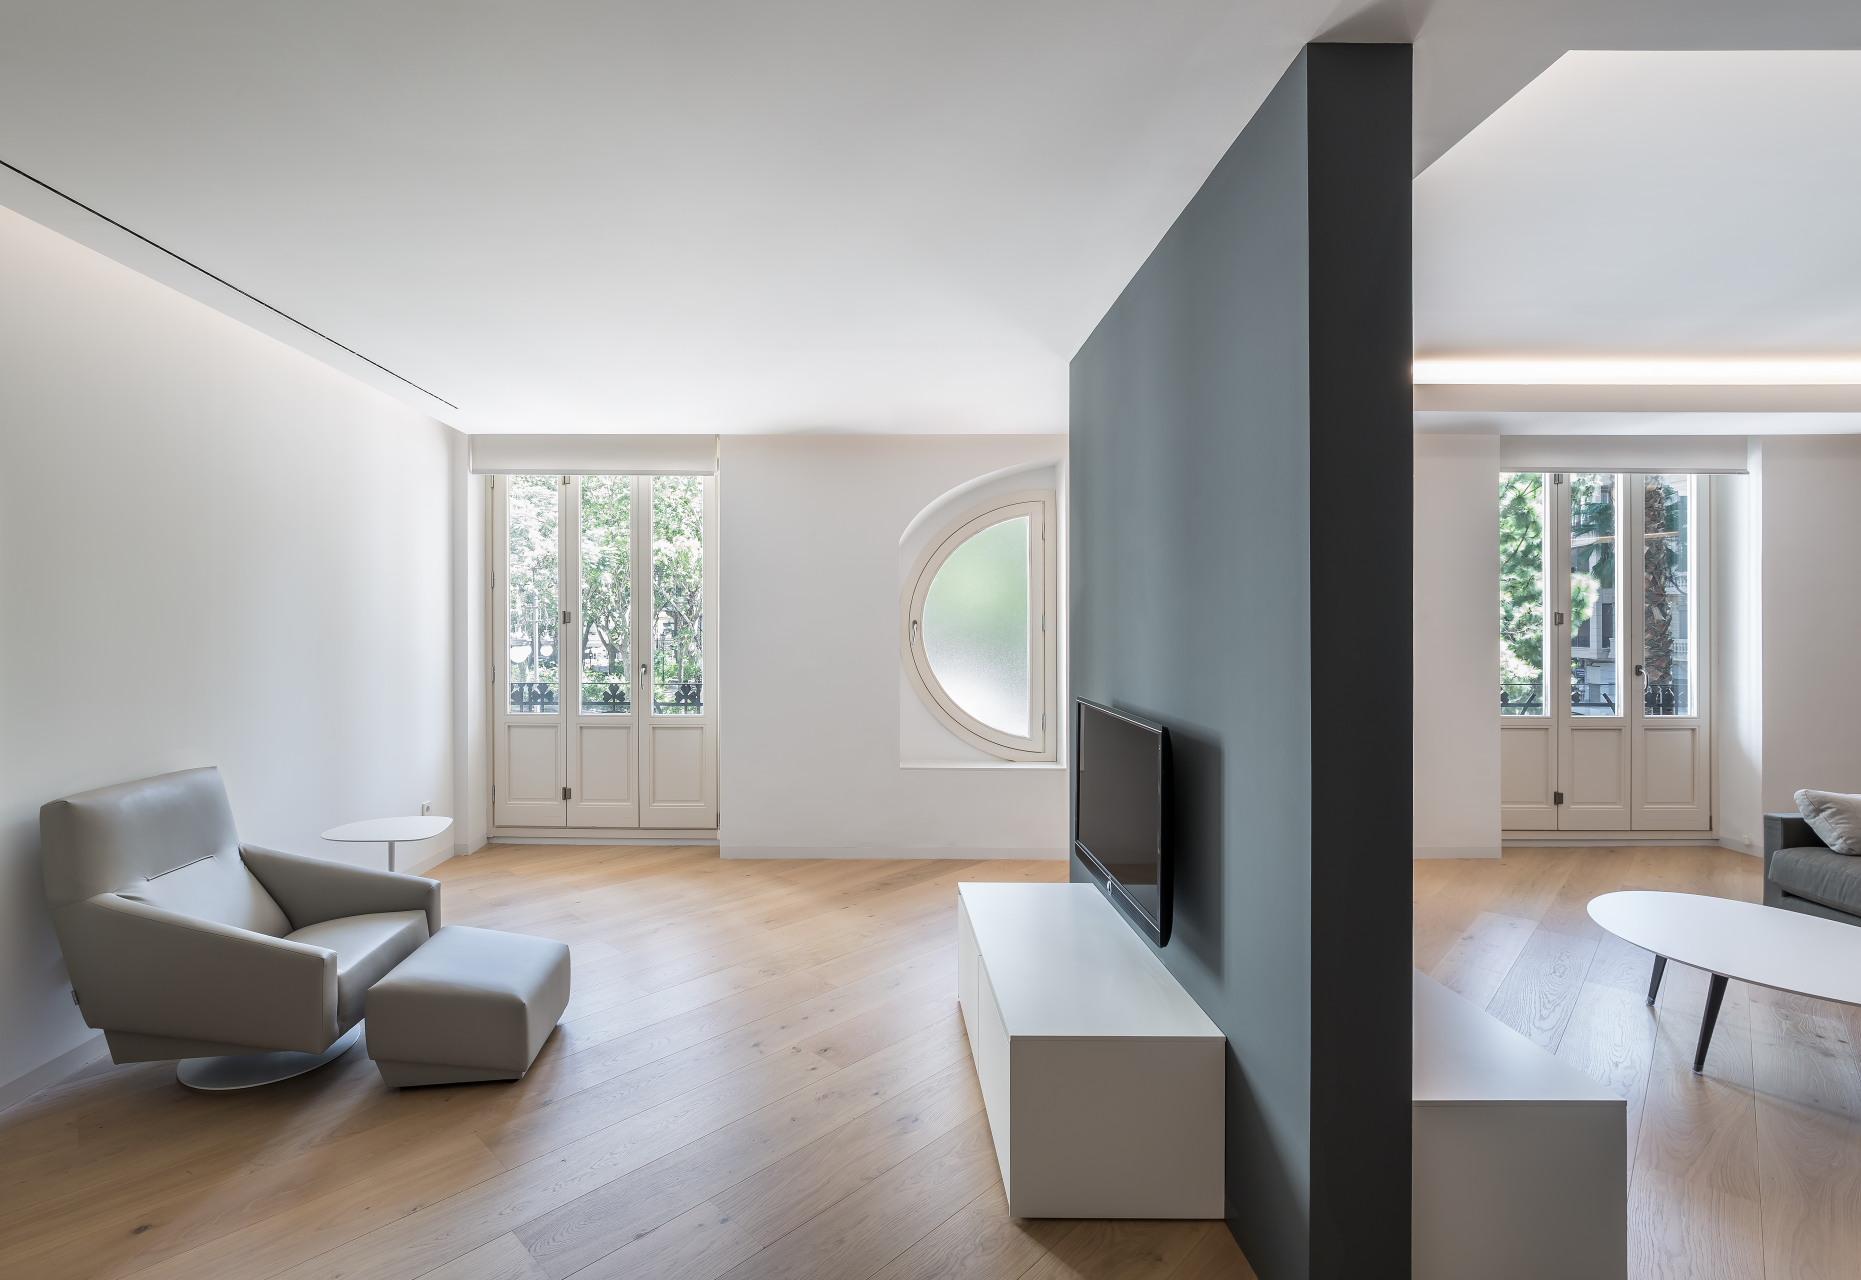 fotografia-arquitectura-interiorismo-valencia-german-cabo-gallardo-llopis-bfm-edificatoria-turia02 (2)